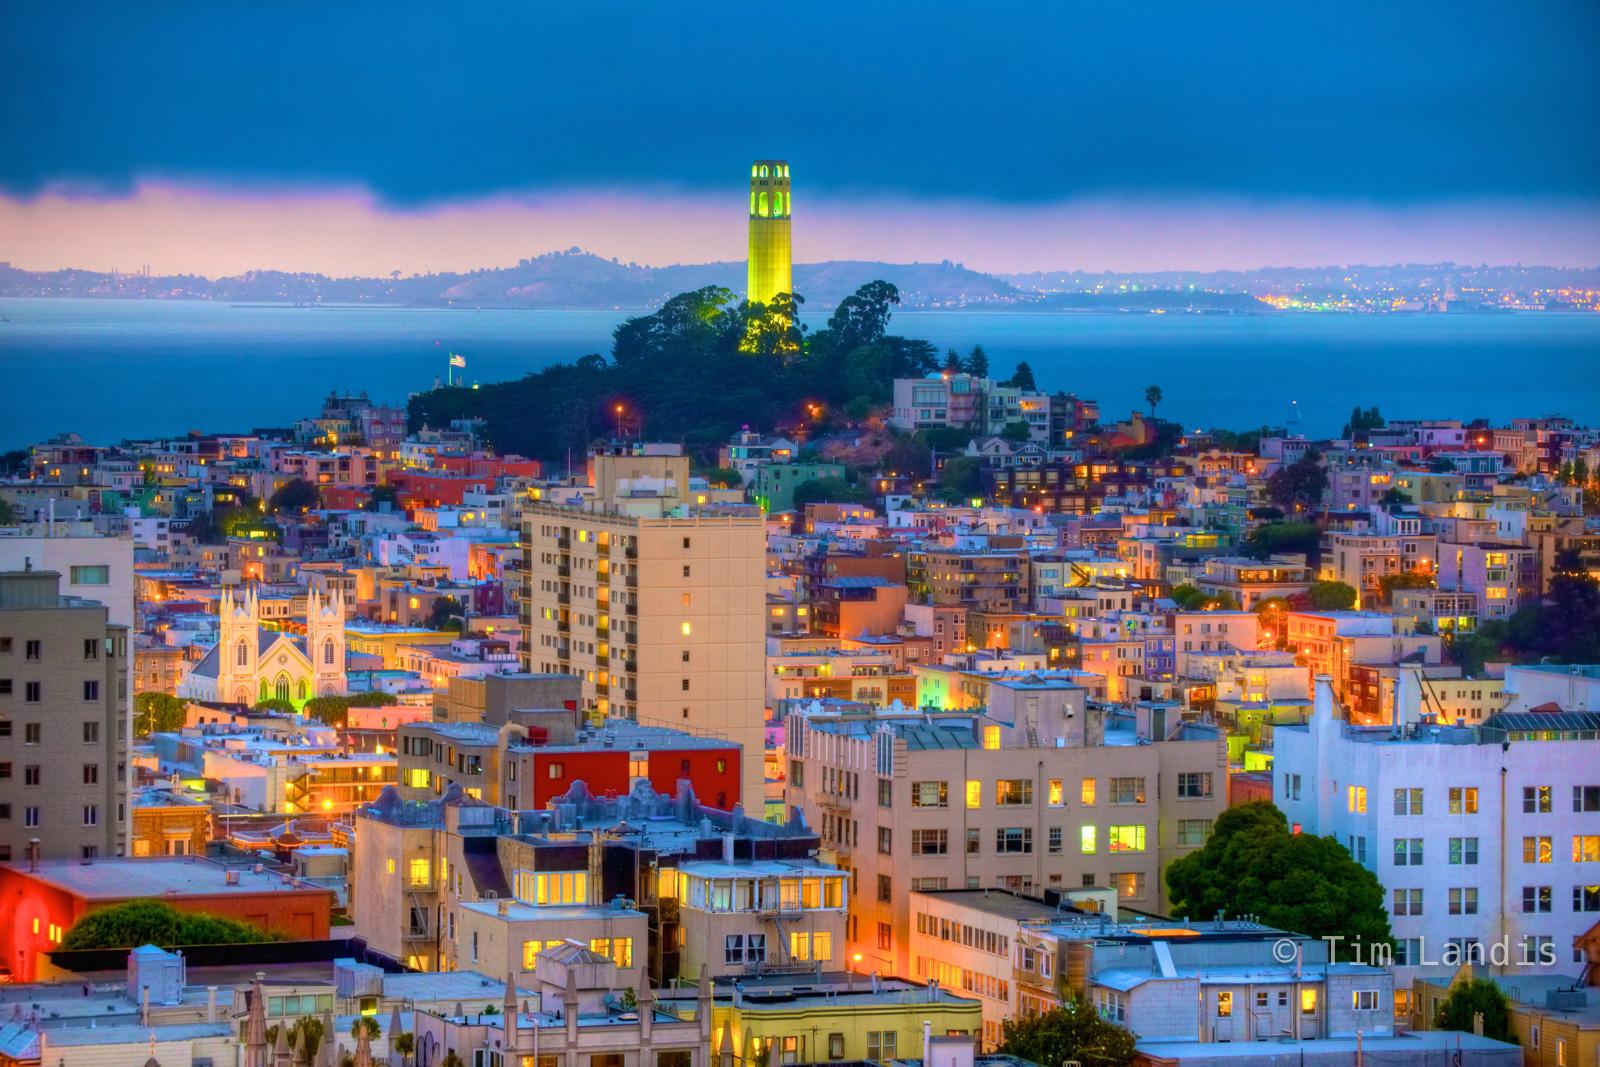 Bay Area, California, Coit Tower, San Francisco, Sunset, Sunset SF style, church, fog, fog over Coit, glow, incoming fog, landmarks, trees, photo